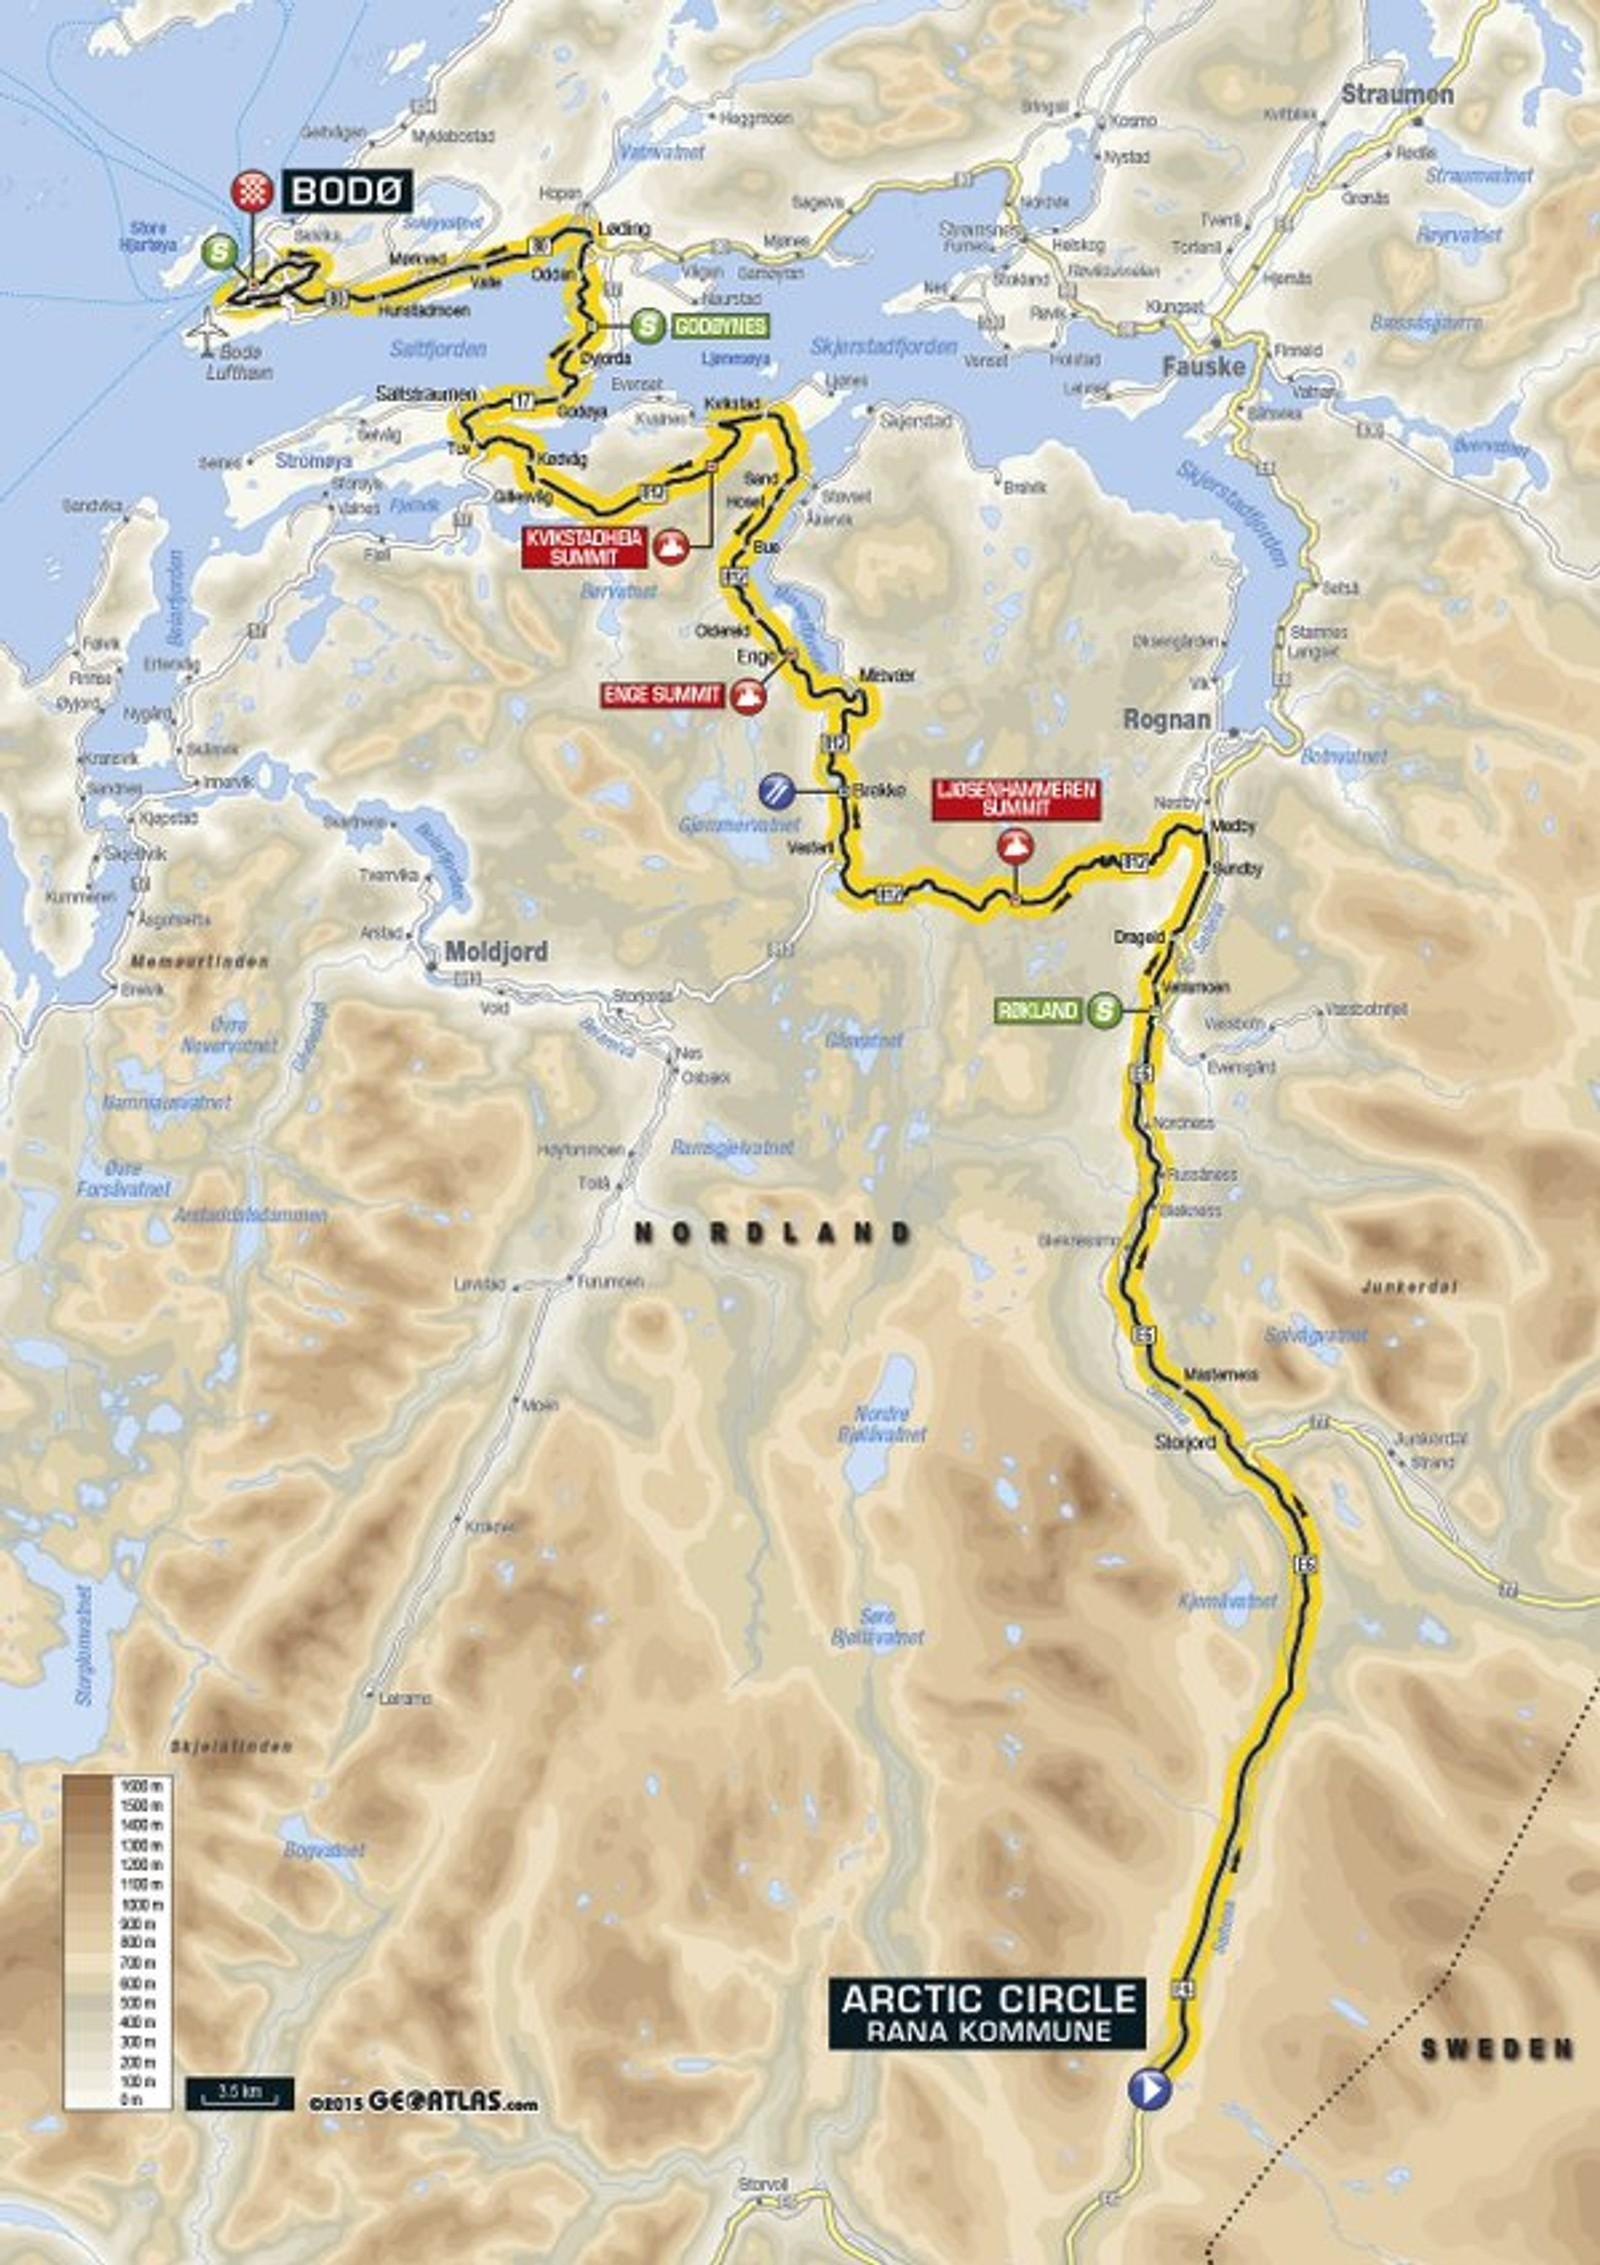 Fjerde og siste etappe er på 193 kilometer og går fra Polarsirkelen til Bodø, hvor det er målgang.